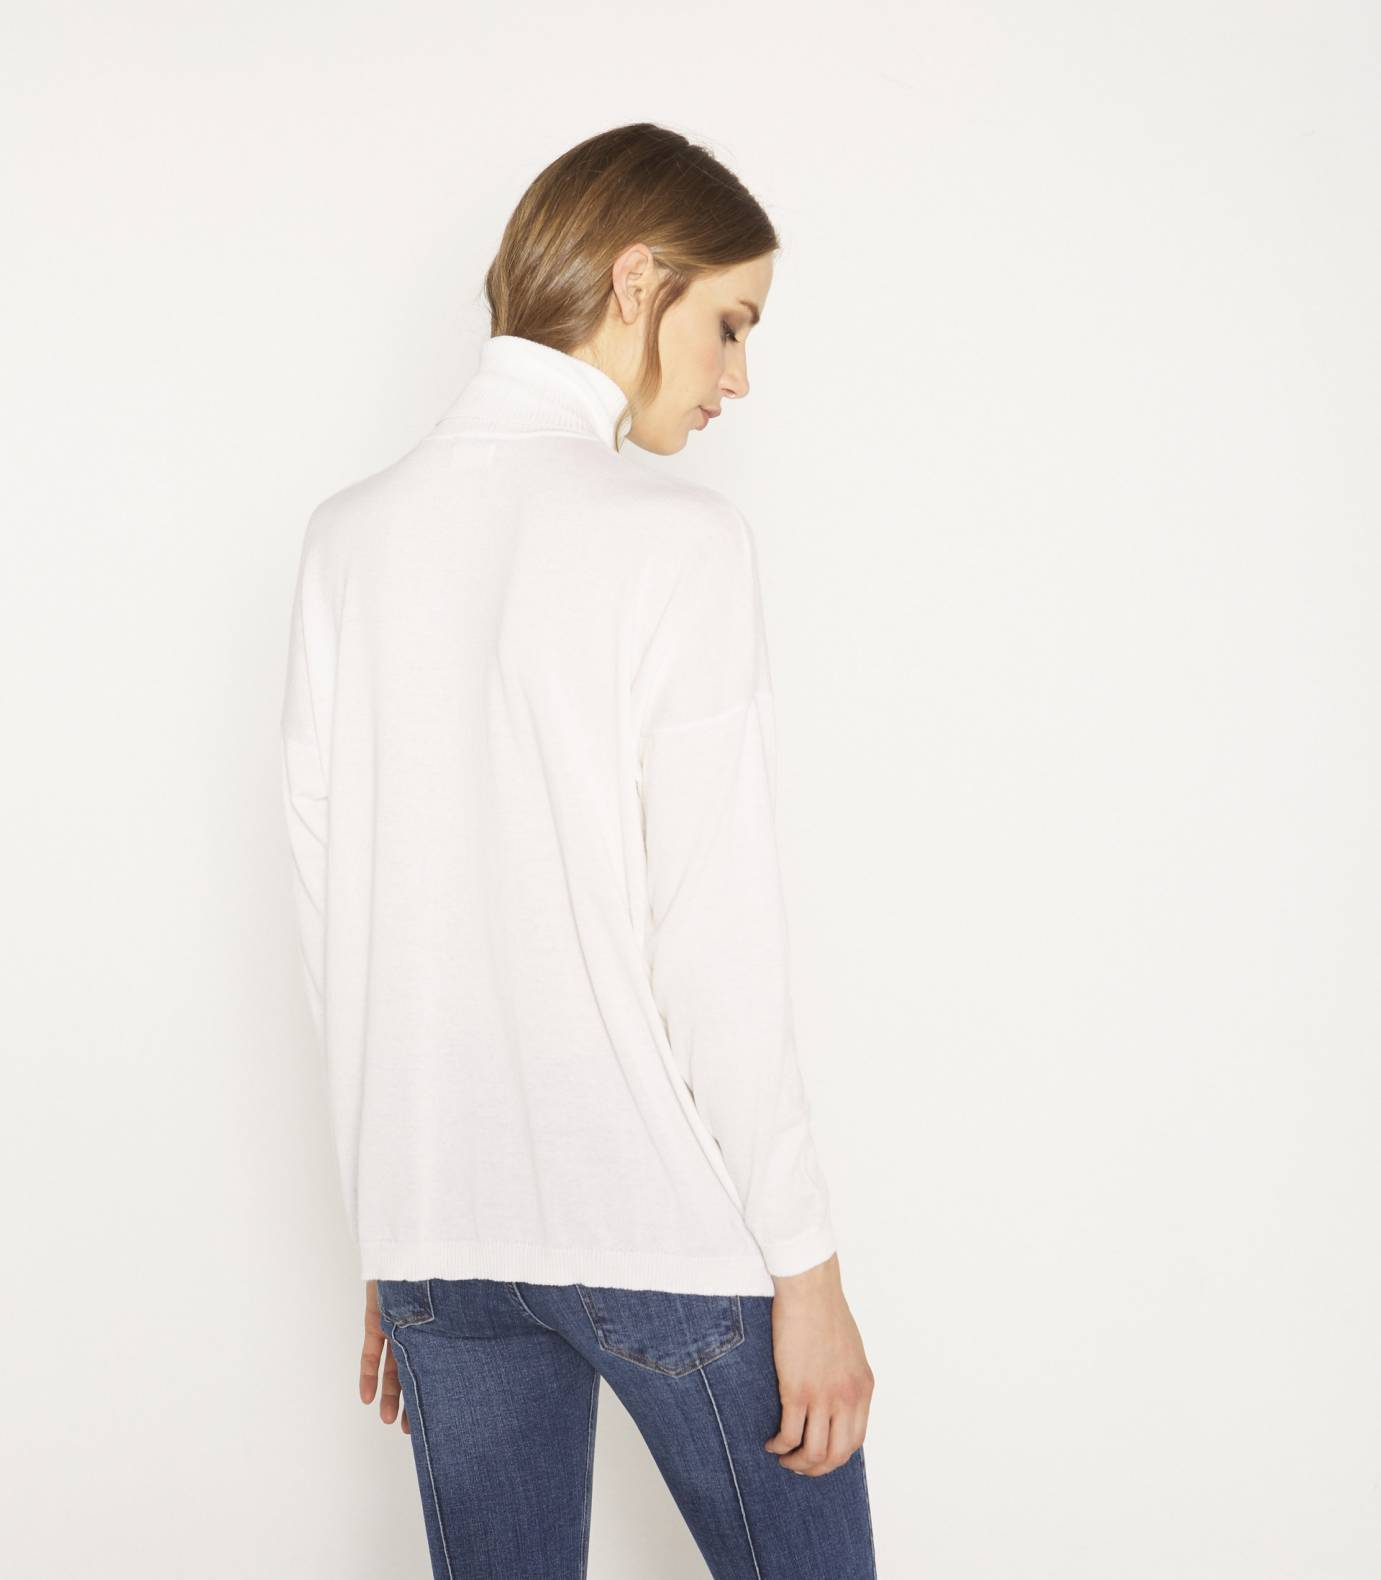 Oversize soft tricot jersey